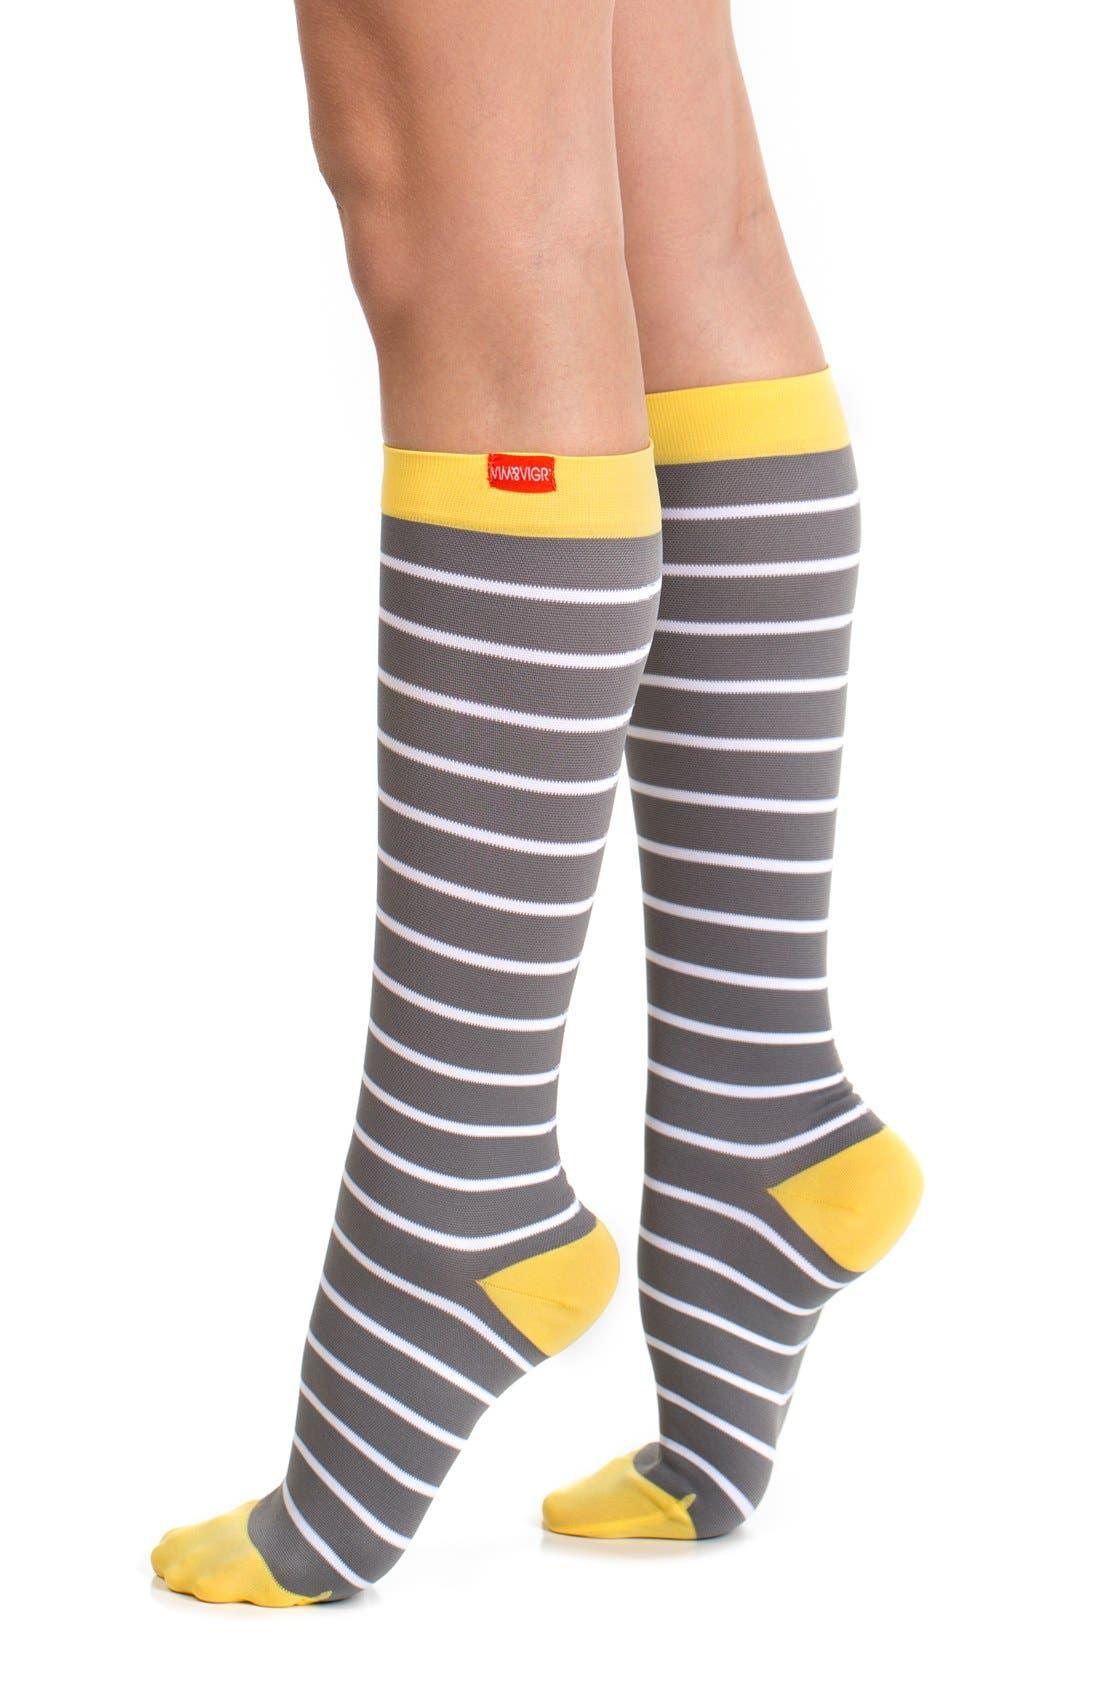 VIM & VIGR Nautical Stripe Graduated Compression Trouser Socks